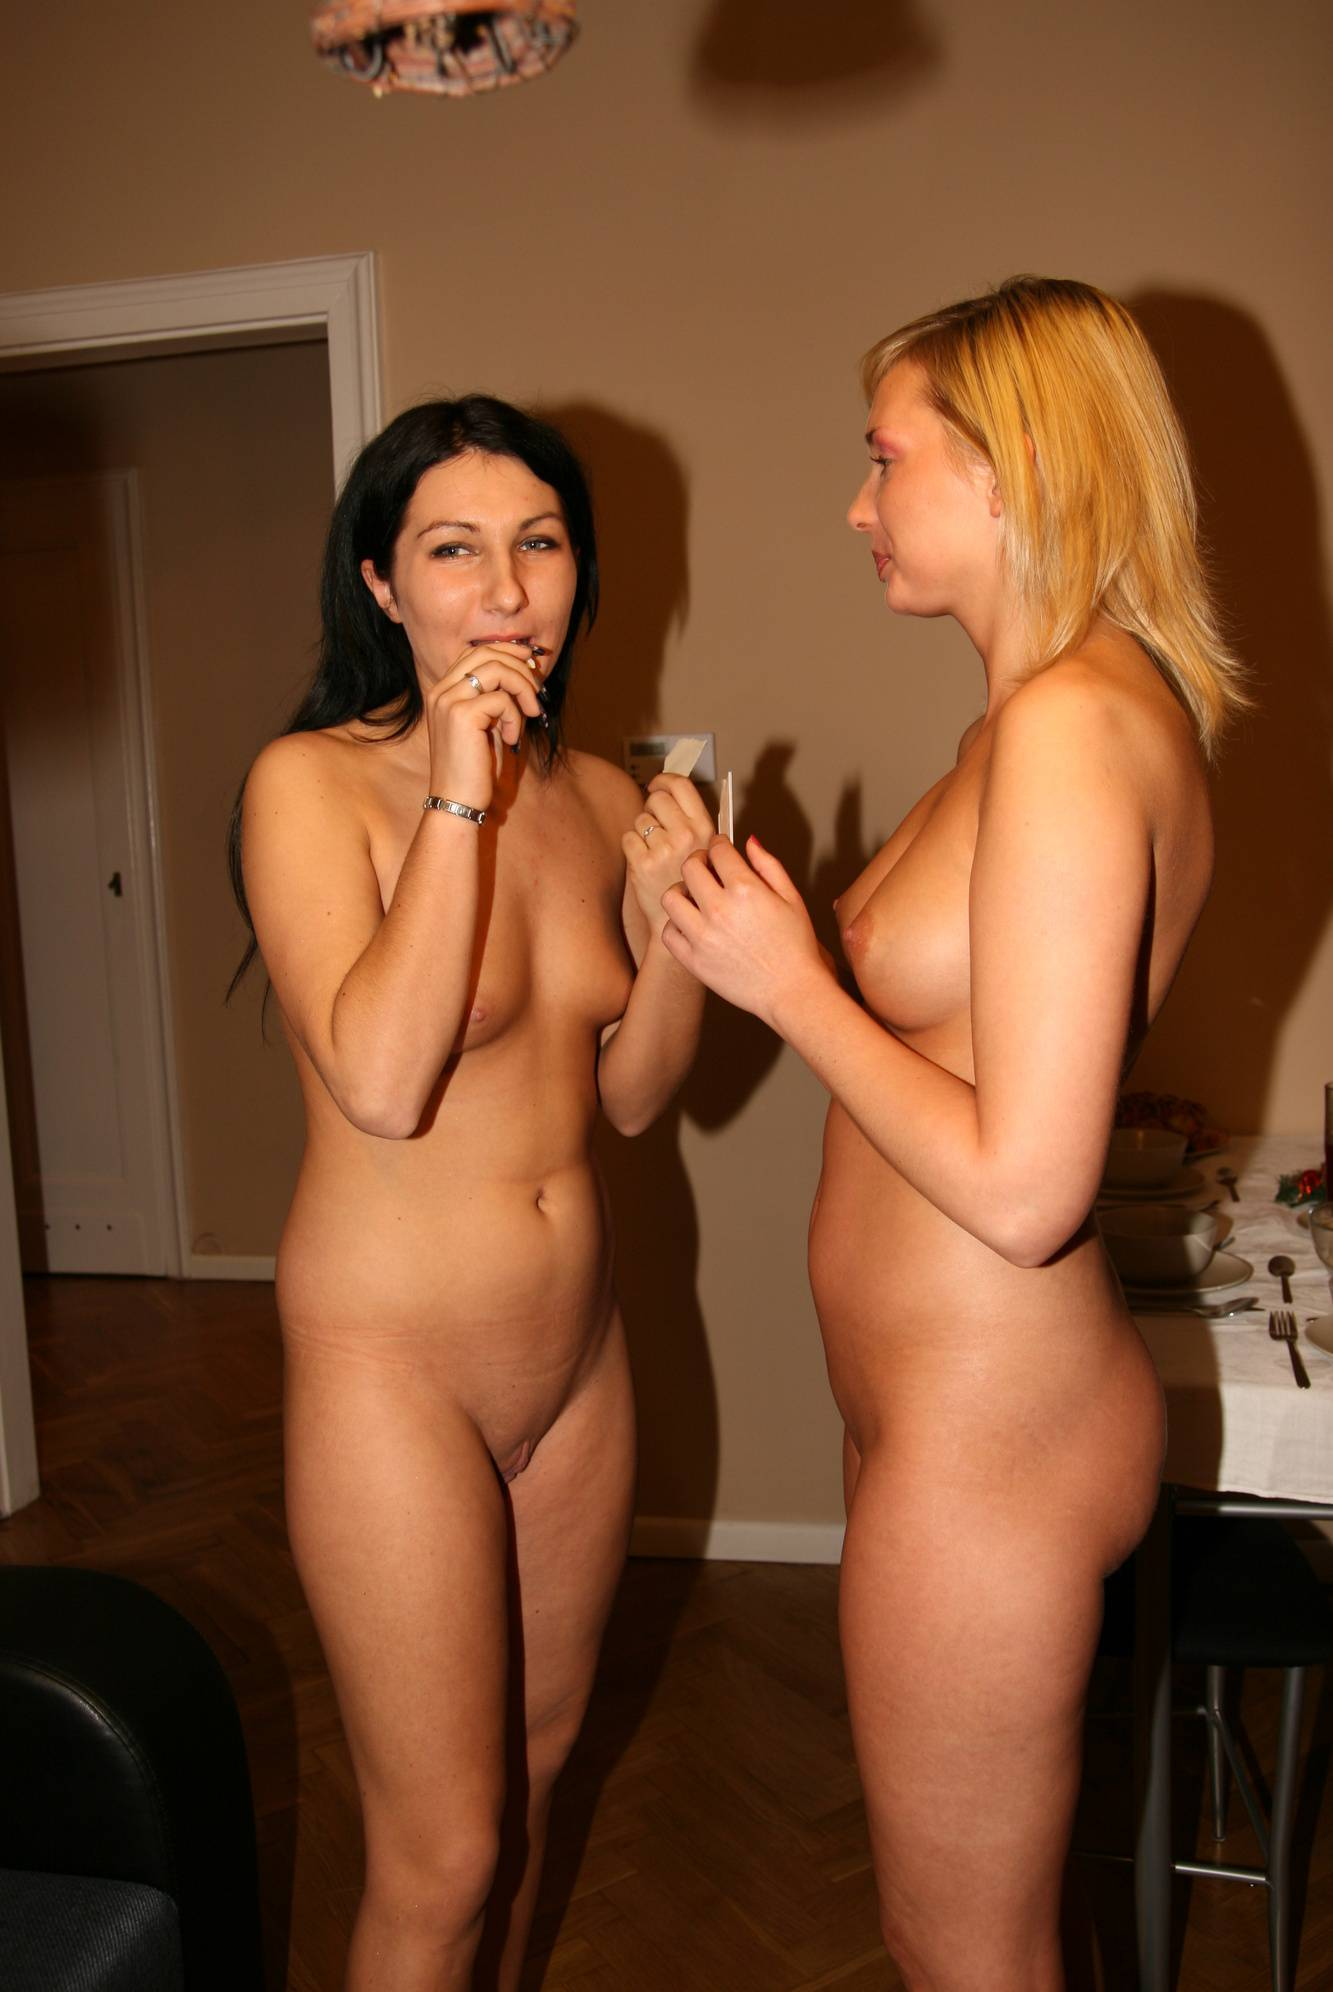 Nudist Pics Happy Nude Year - 1